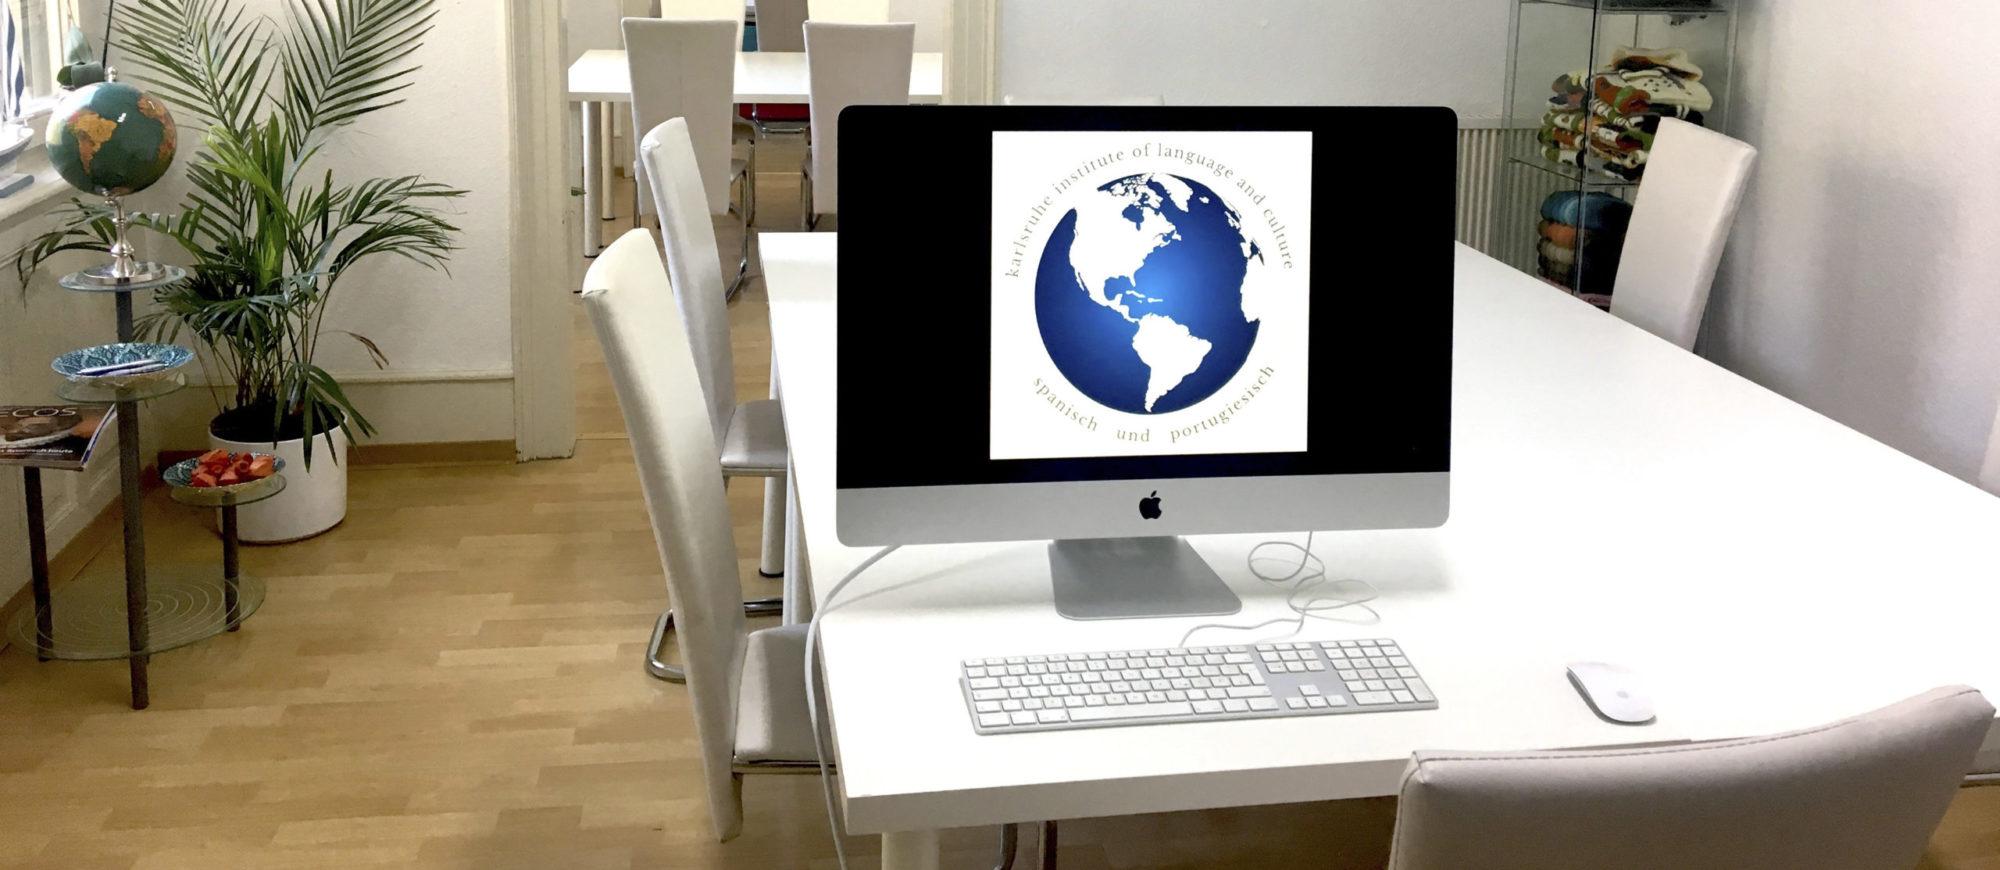 Coronavirus Einschränkungen - Jetzt Online Kurse